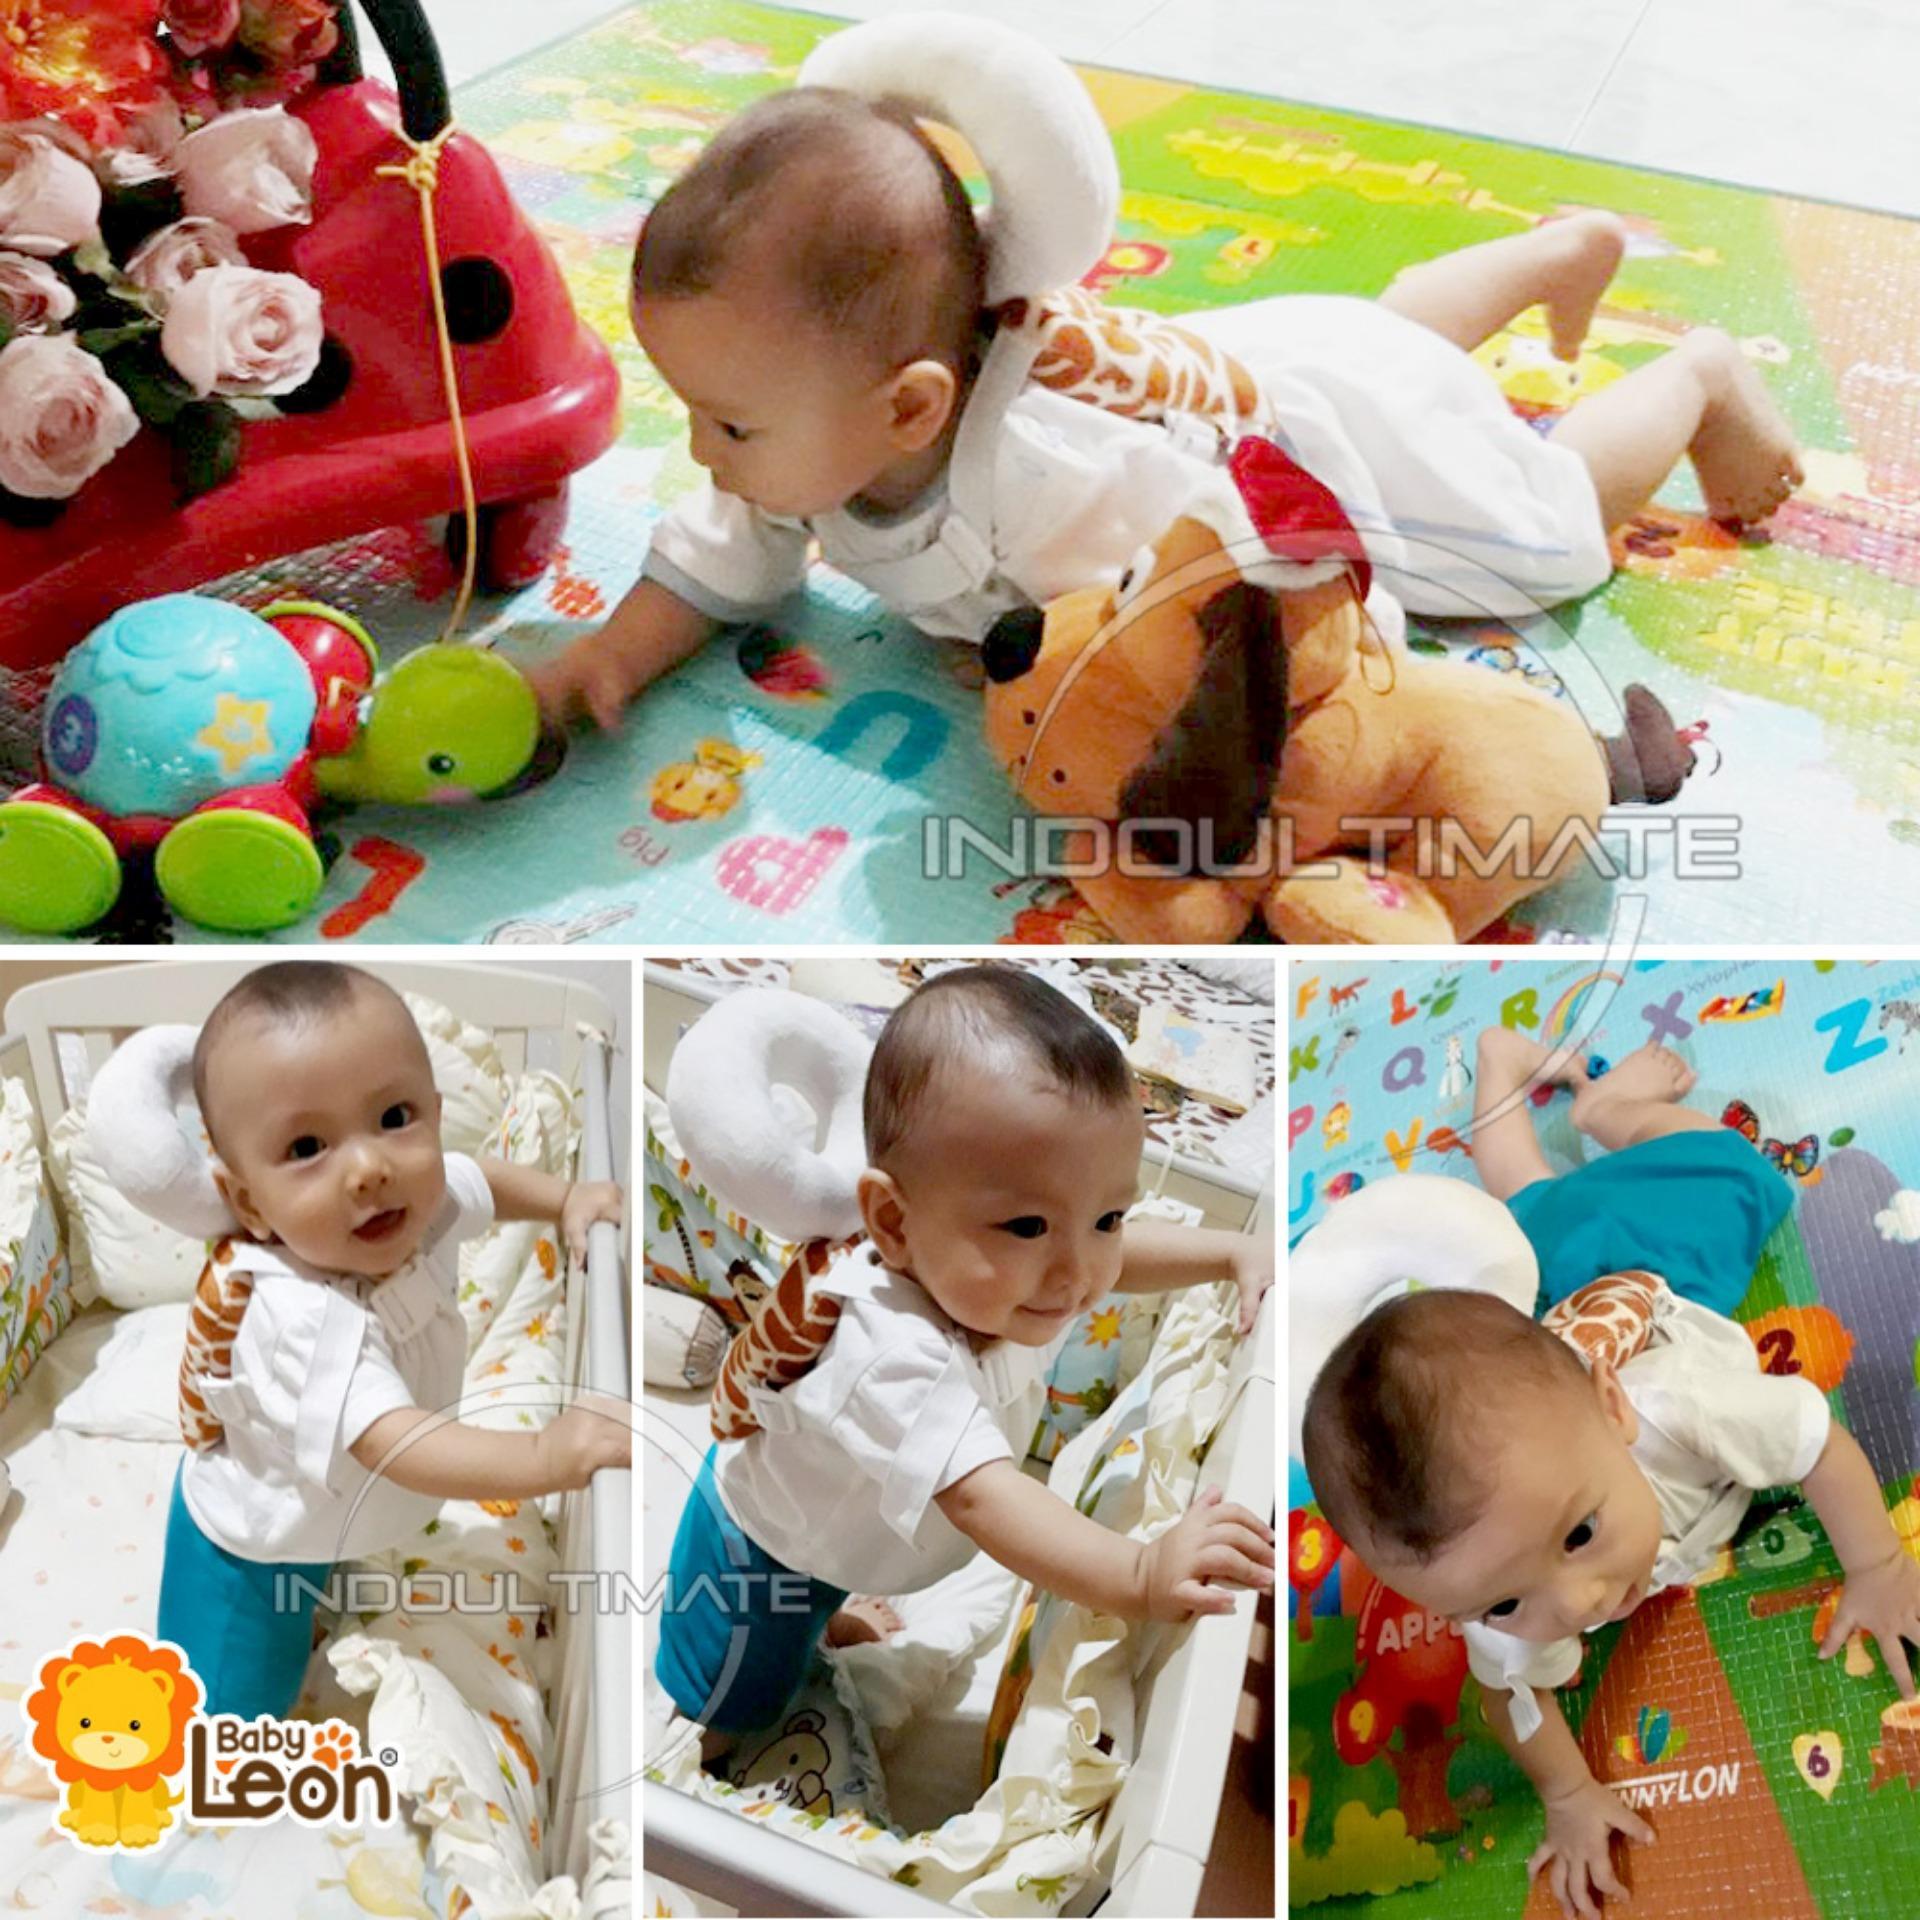 Ultimate Pelindung Pengaman Kepala Dan Punggung Bayi Balita Babyhead Bantal Anak Motif Baby Head Protector Hr 01